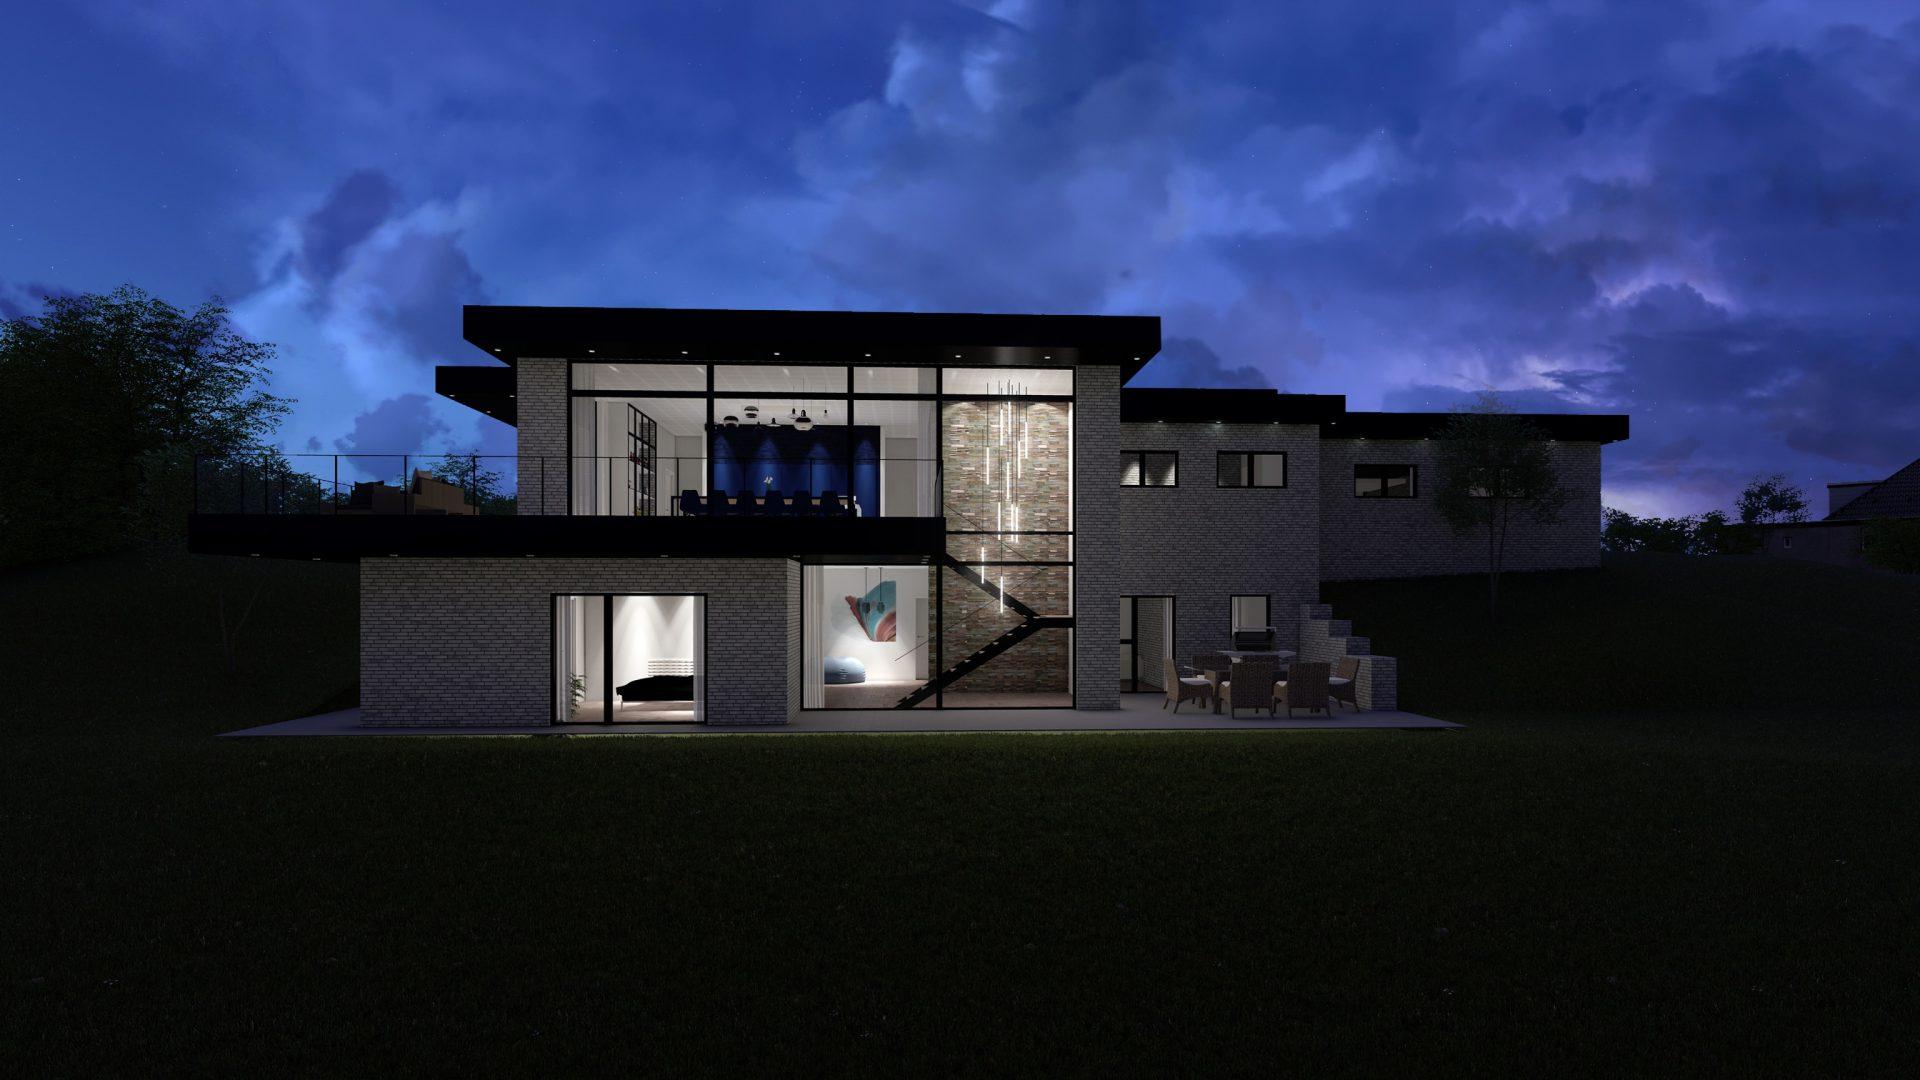 Nybyggeri Aalborg, Århus , Nordjylland, nyt murstens hus